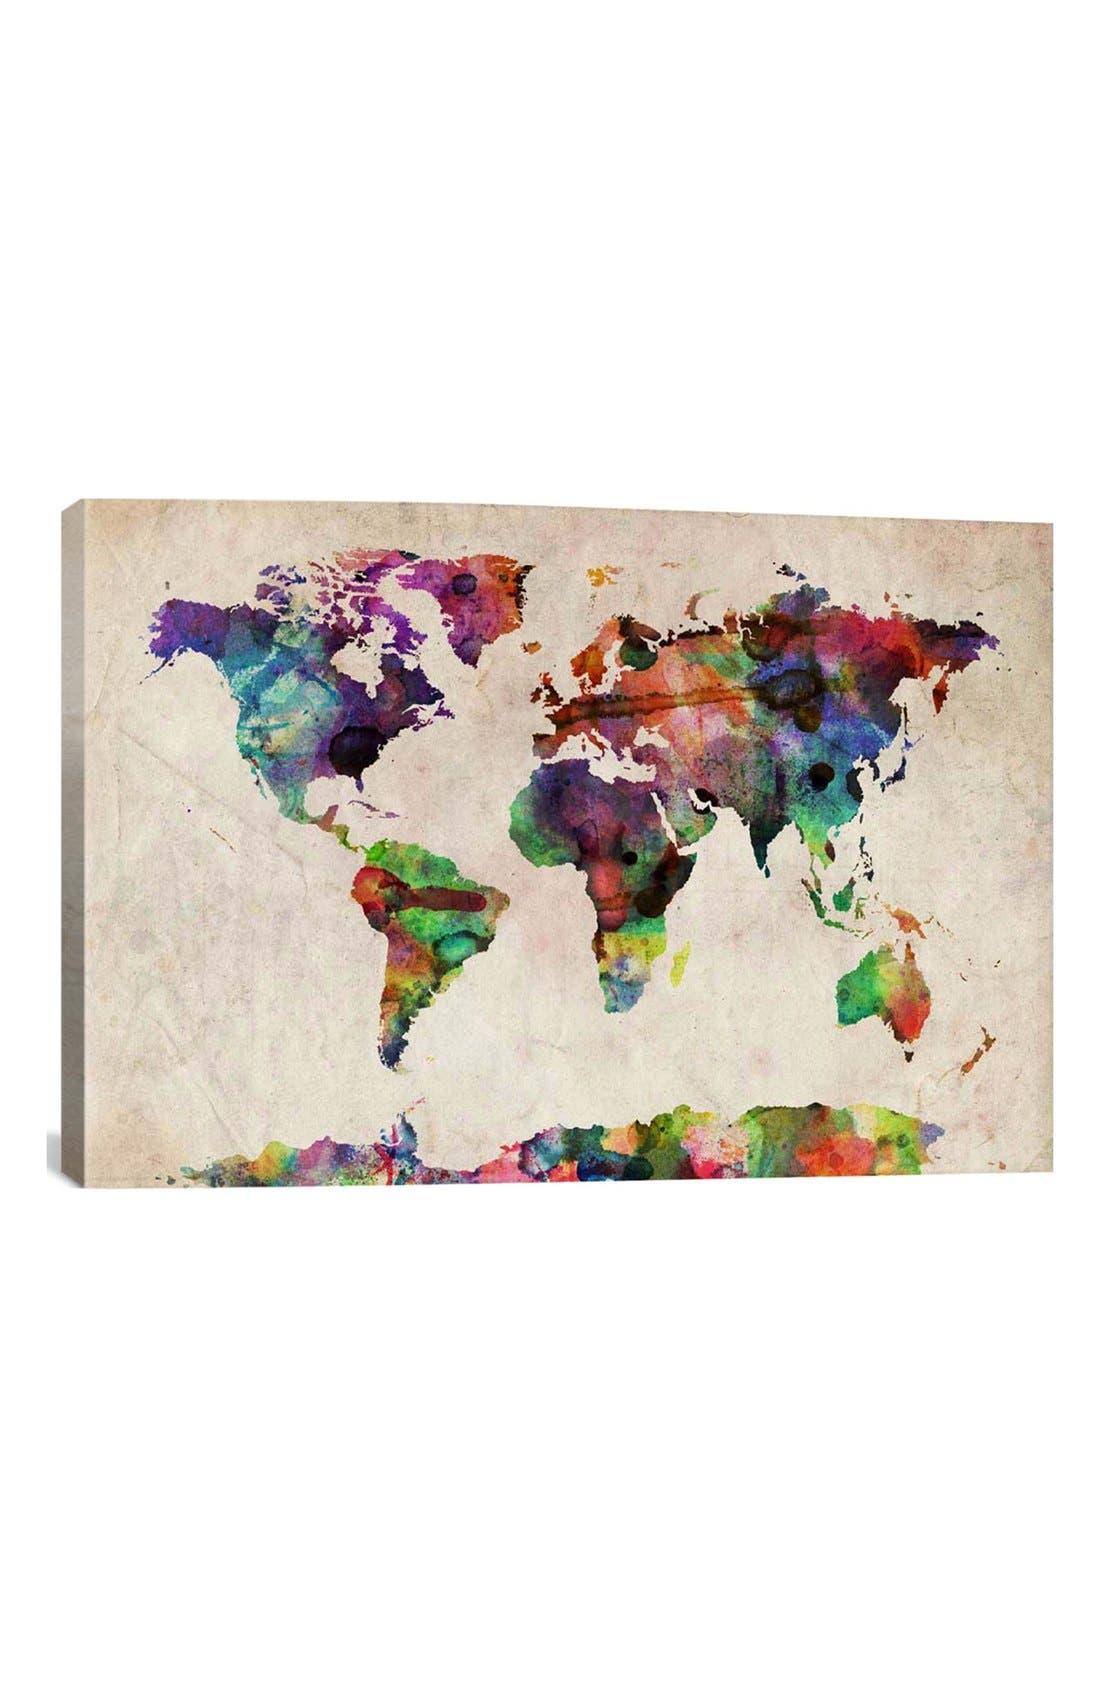 'World Map Urban - Michael Thompsett' Giclée Print Canvas Art,                         Main,                         color, Beige